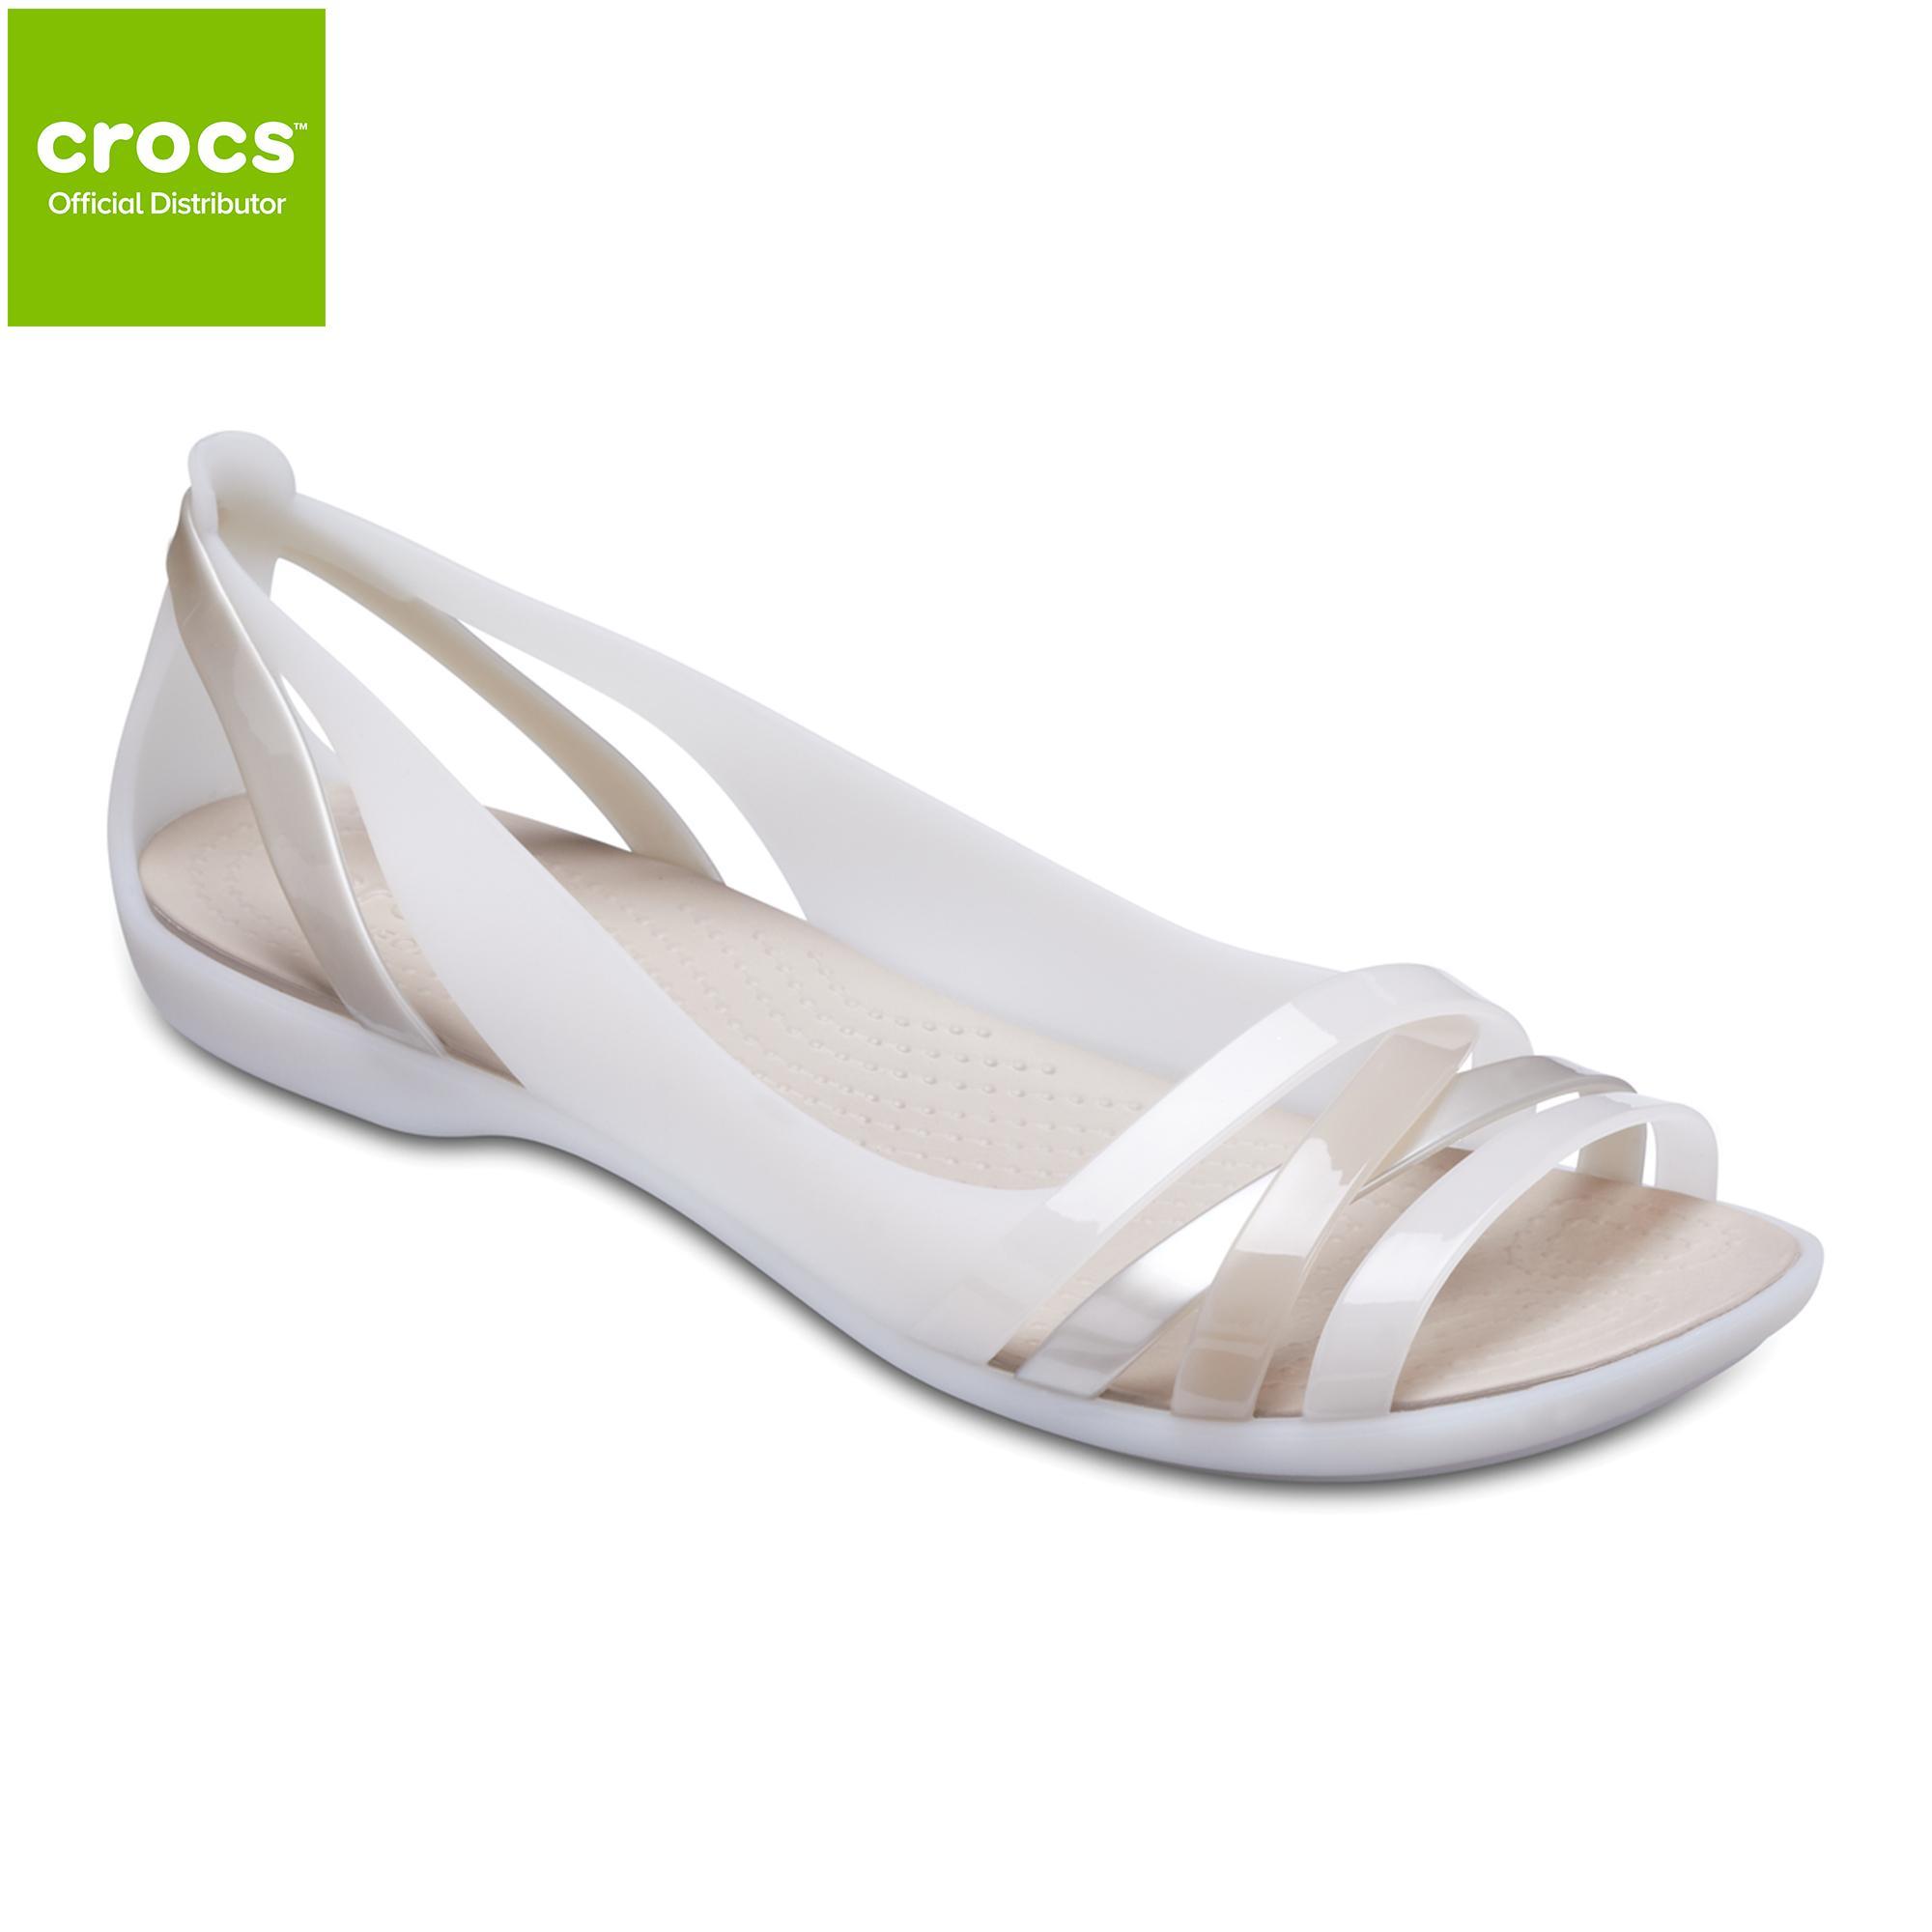 4fe6ab34e0587 Crocs Philippines  Crocs price list - Crocs Flats